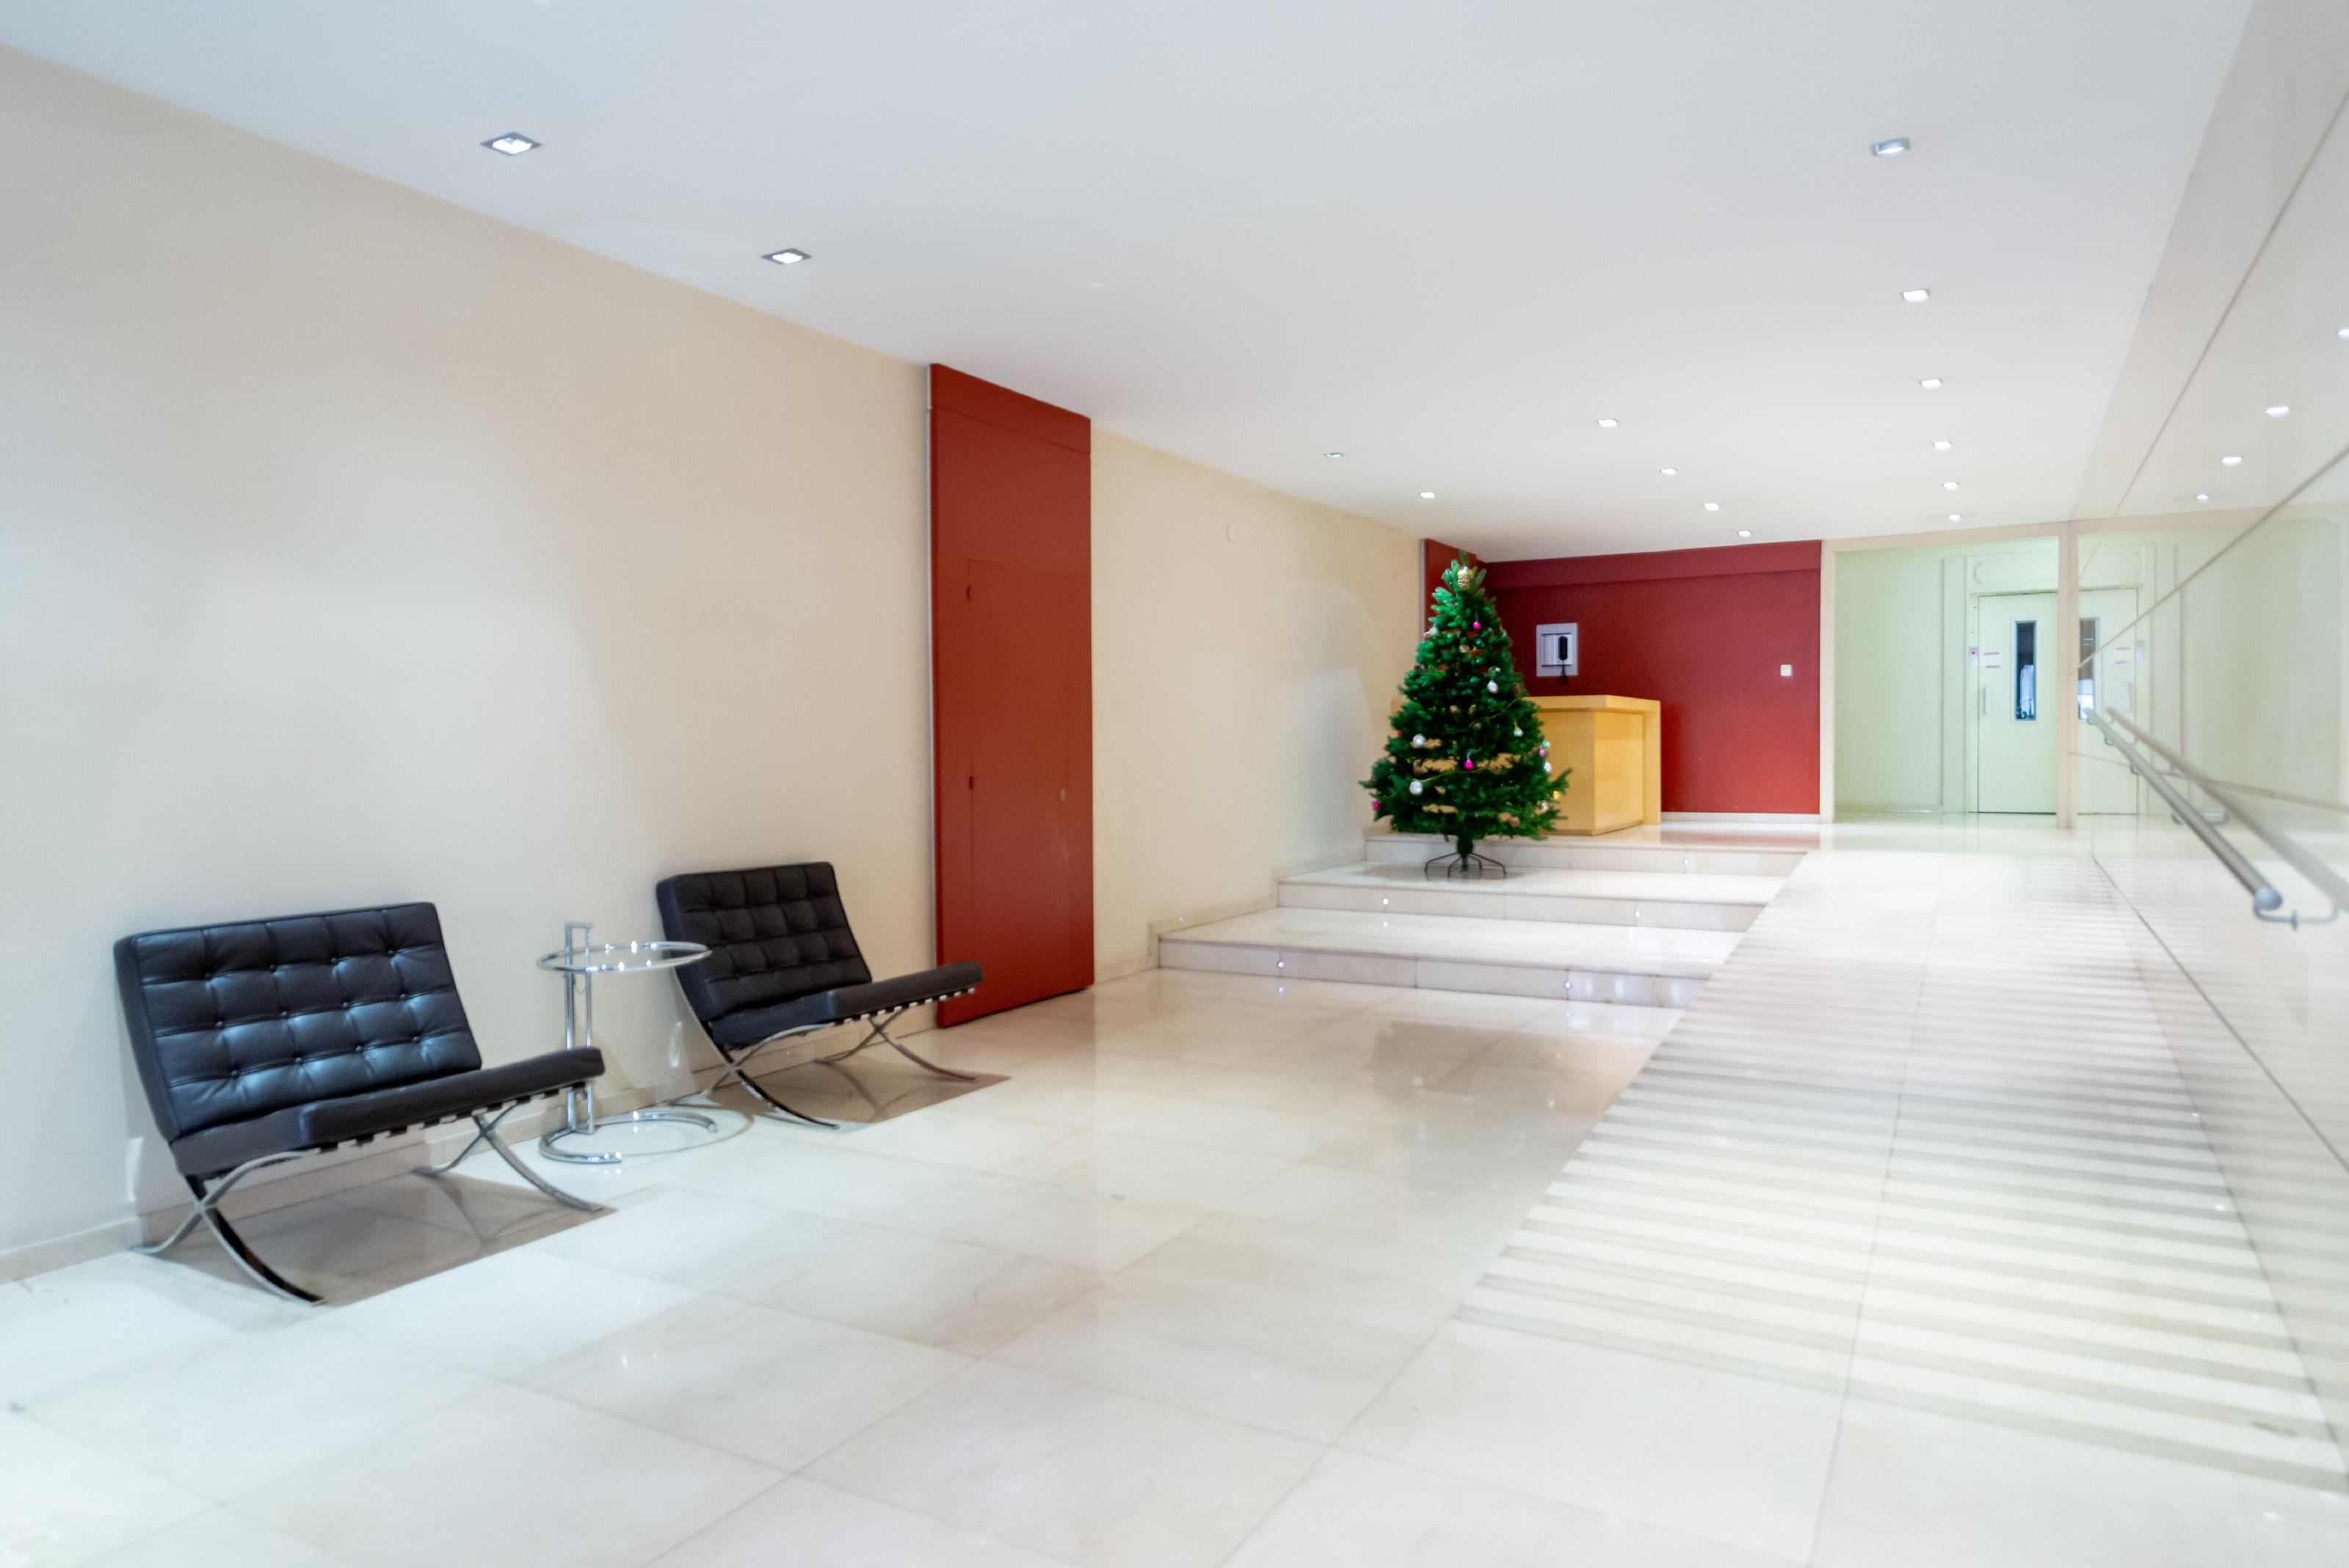 245231 Flat for sale in Sarrià-Sant Gervasi, Sant Gervasi-Galvany 33